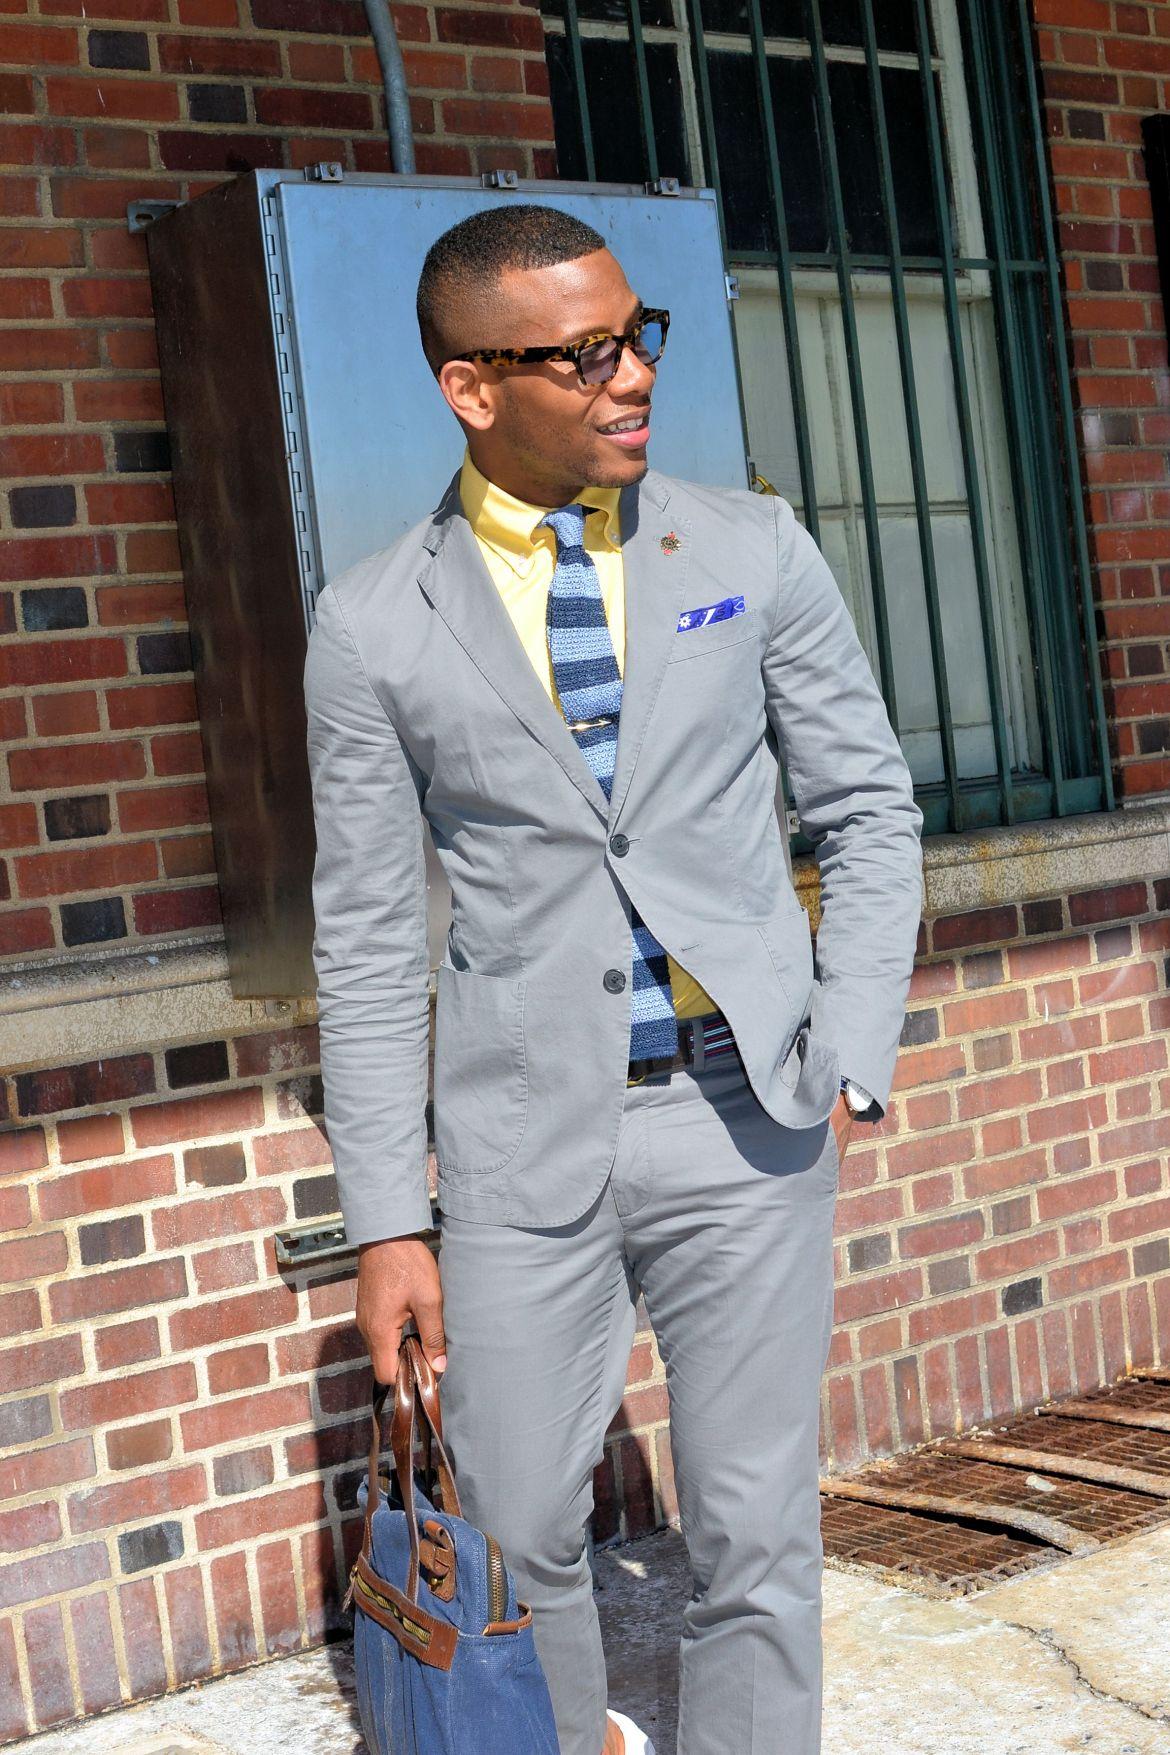 Men's Style Pro in Mizzen+Main Shirt